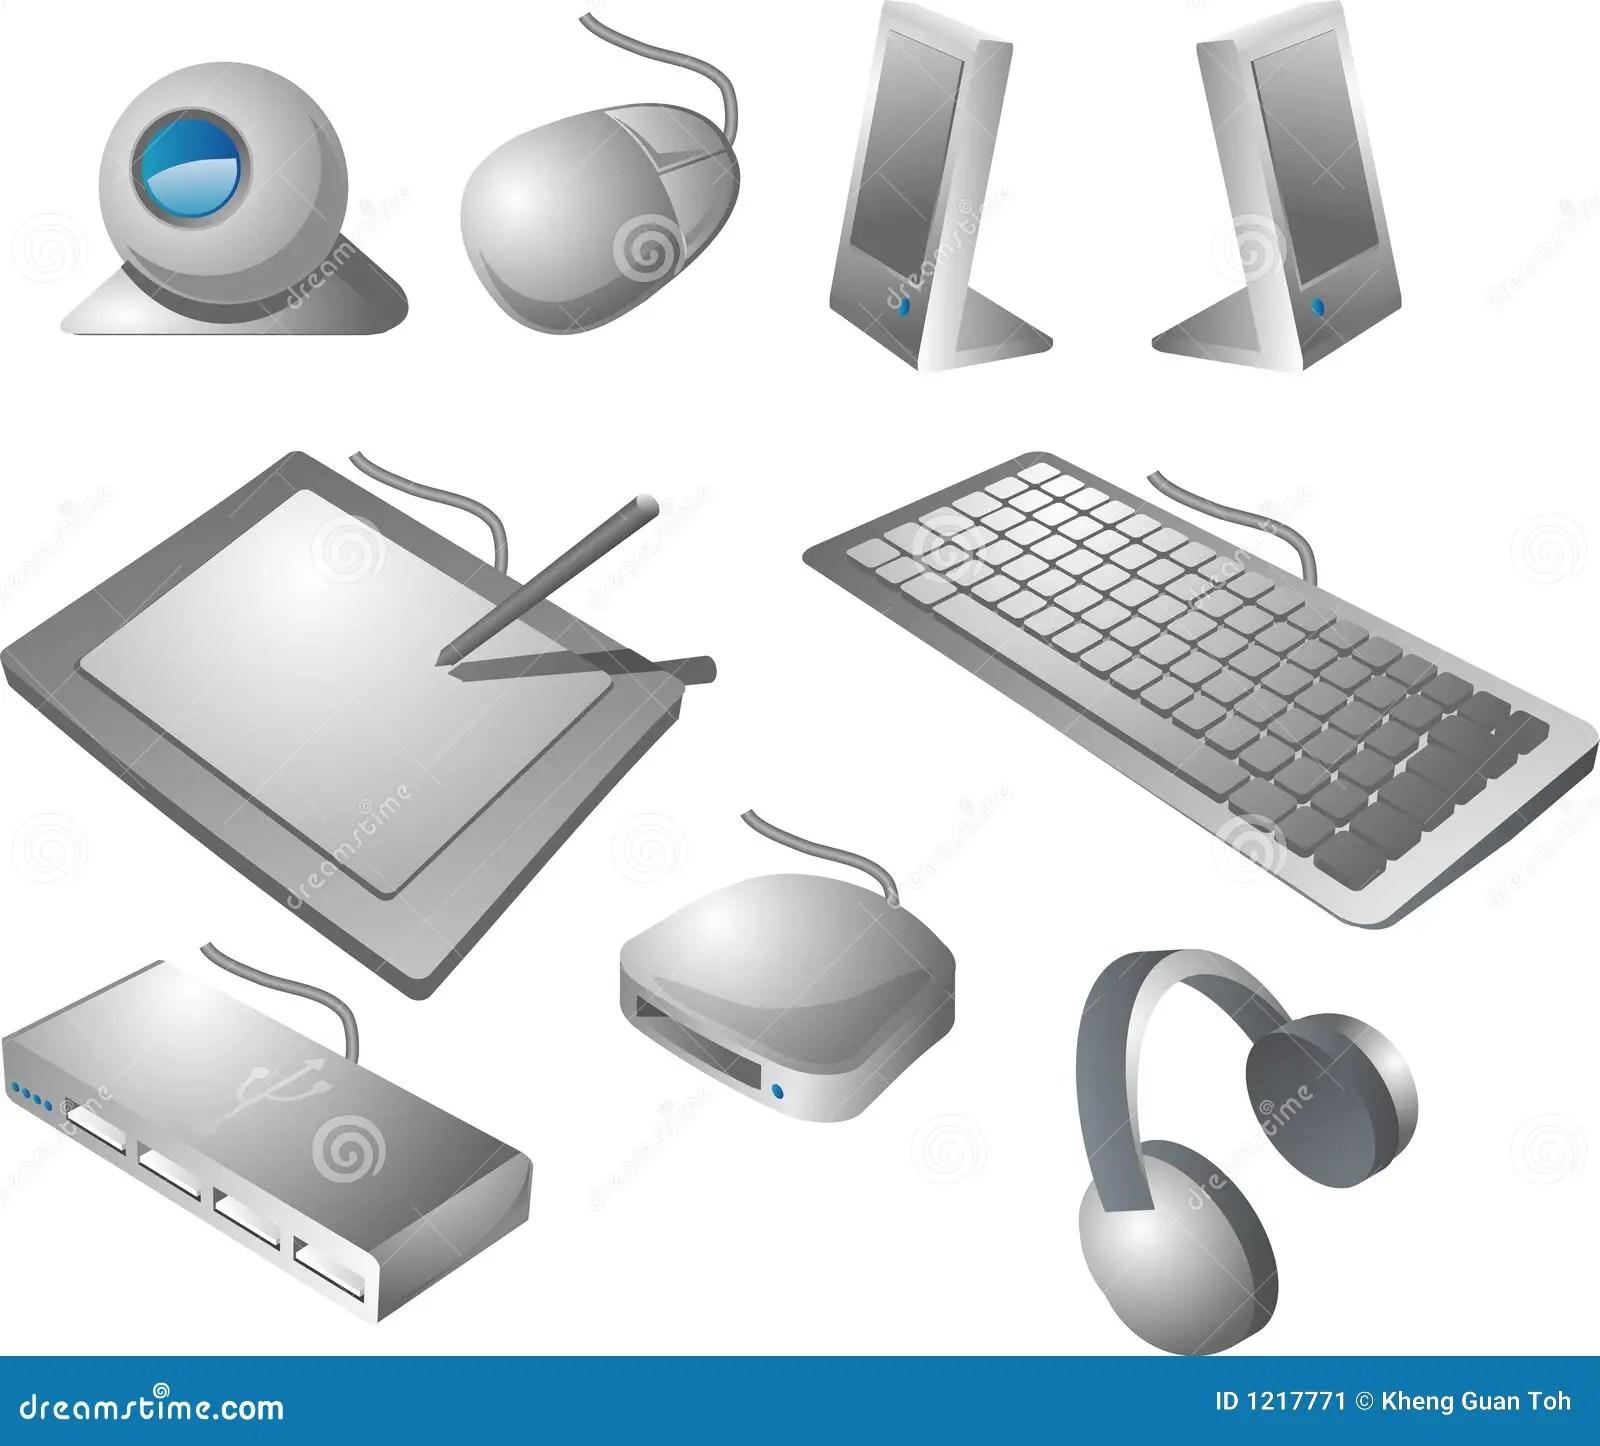 Define Worksheet Of Computer